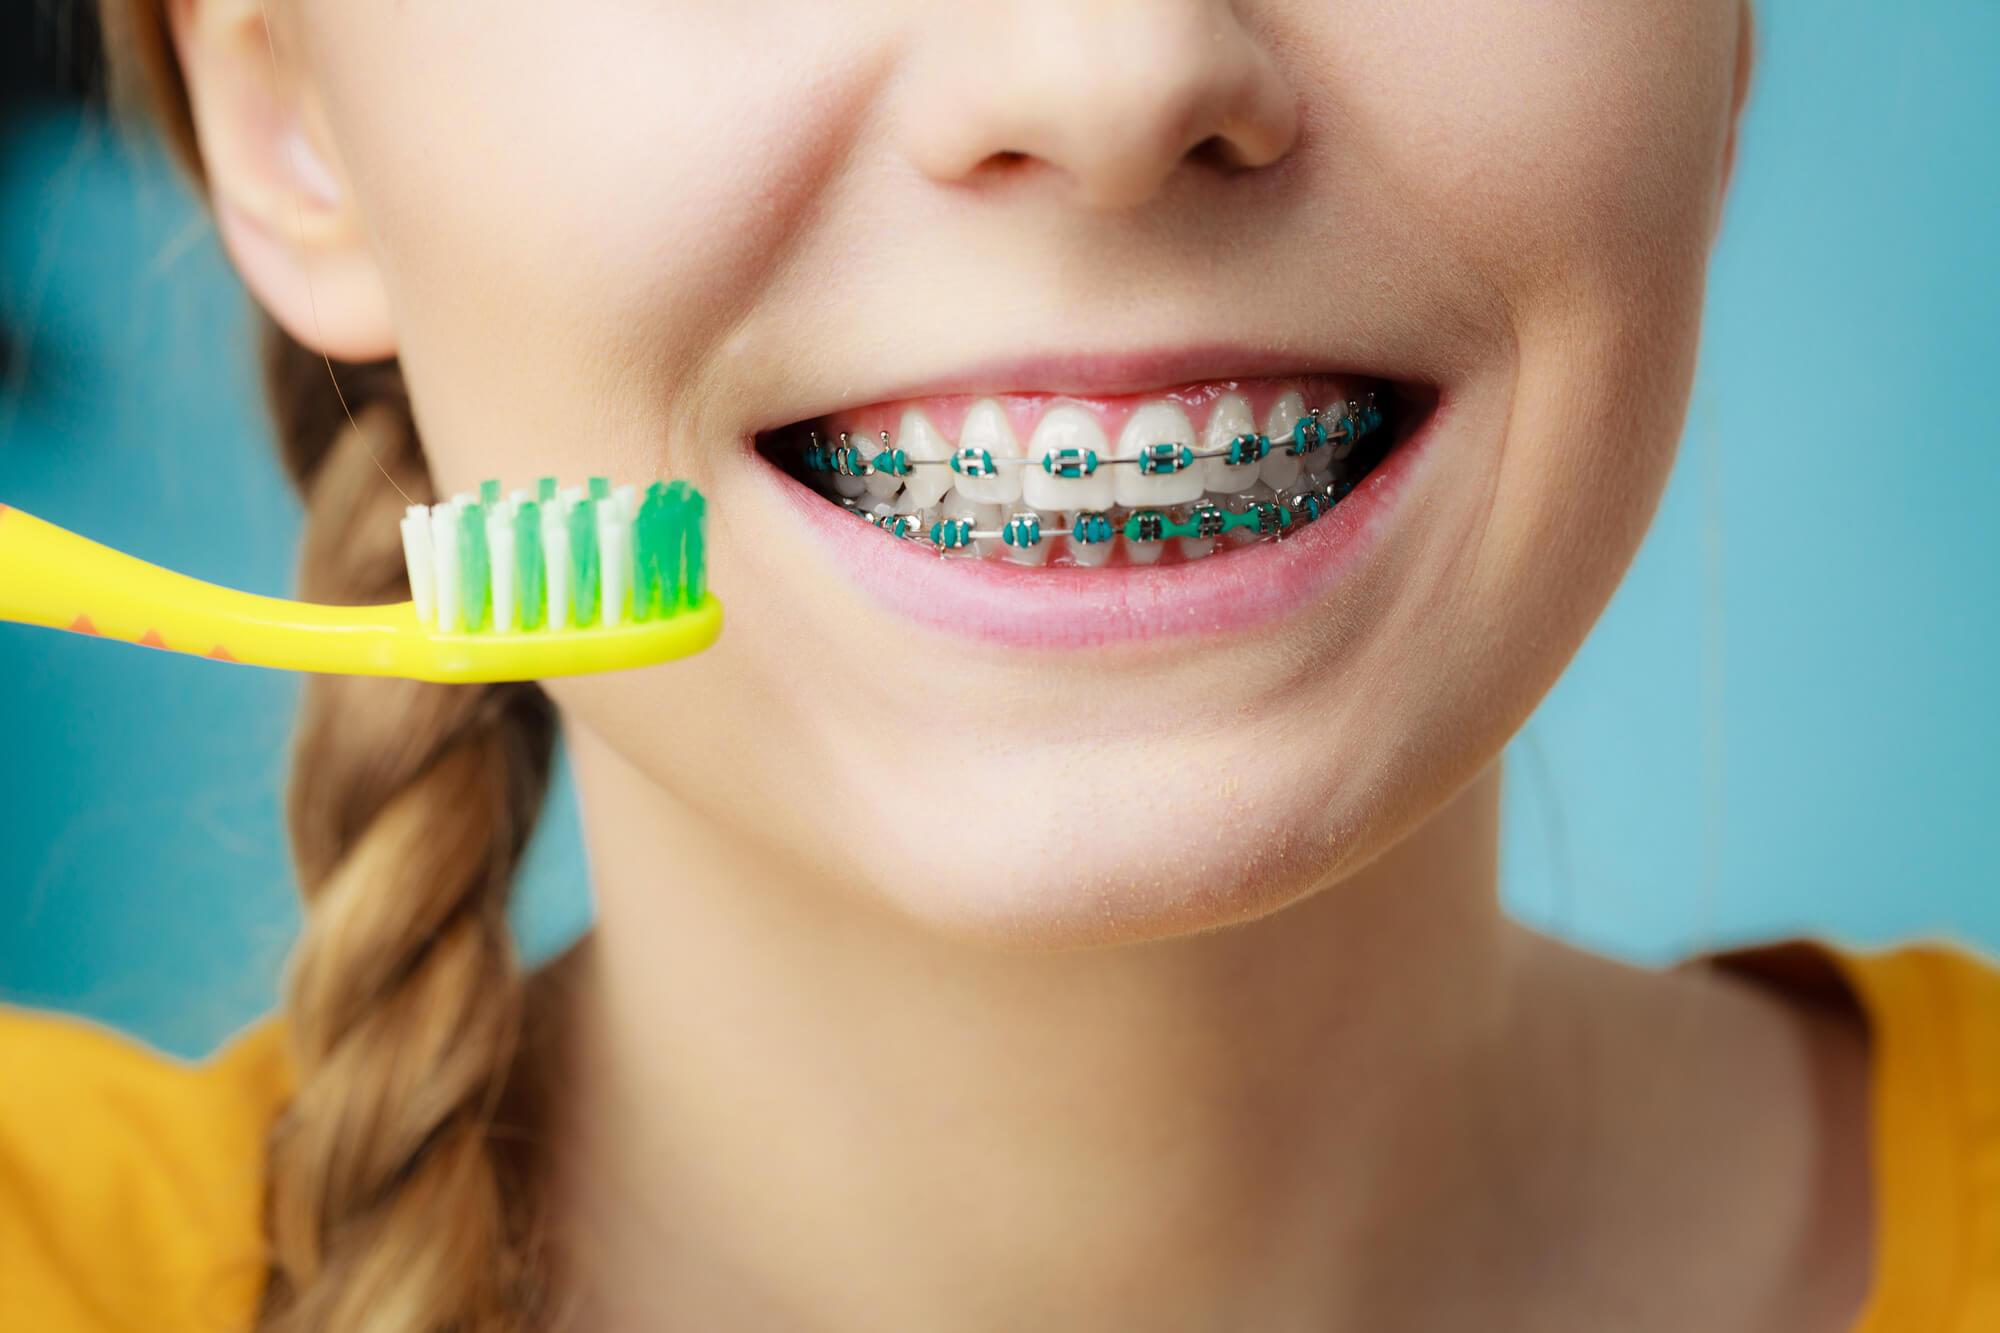 Woman with teeth braces using brush